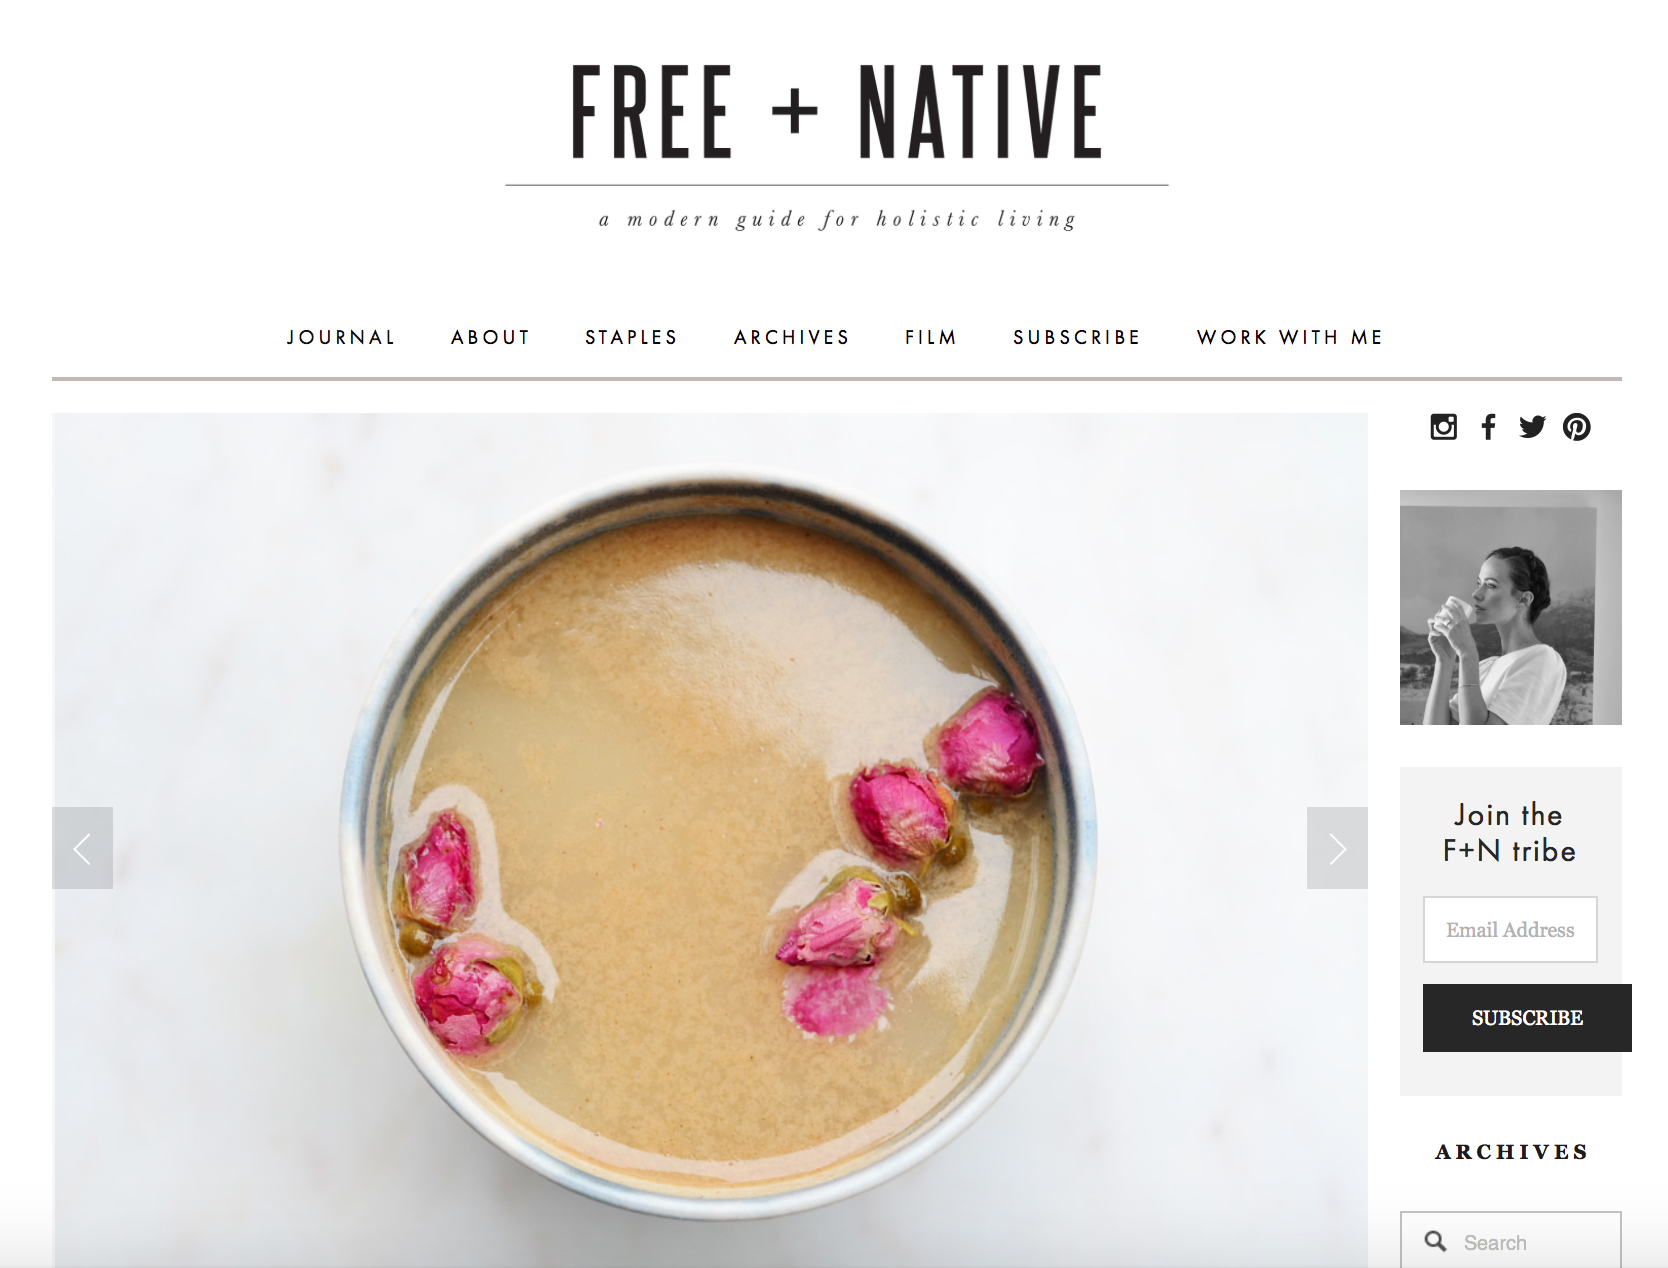 freeandnative.com:free-native-1:2015:7:13:qi5hz40ch90onblstzqykavsnbx5nw?rq=alexa%20gray.png